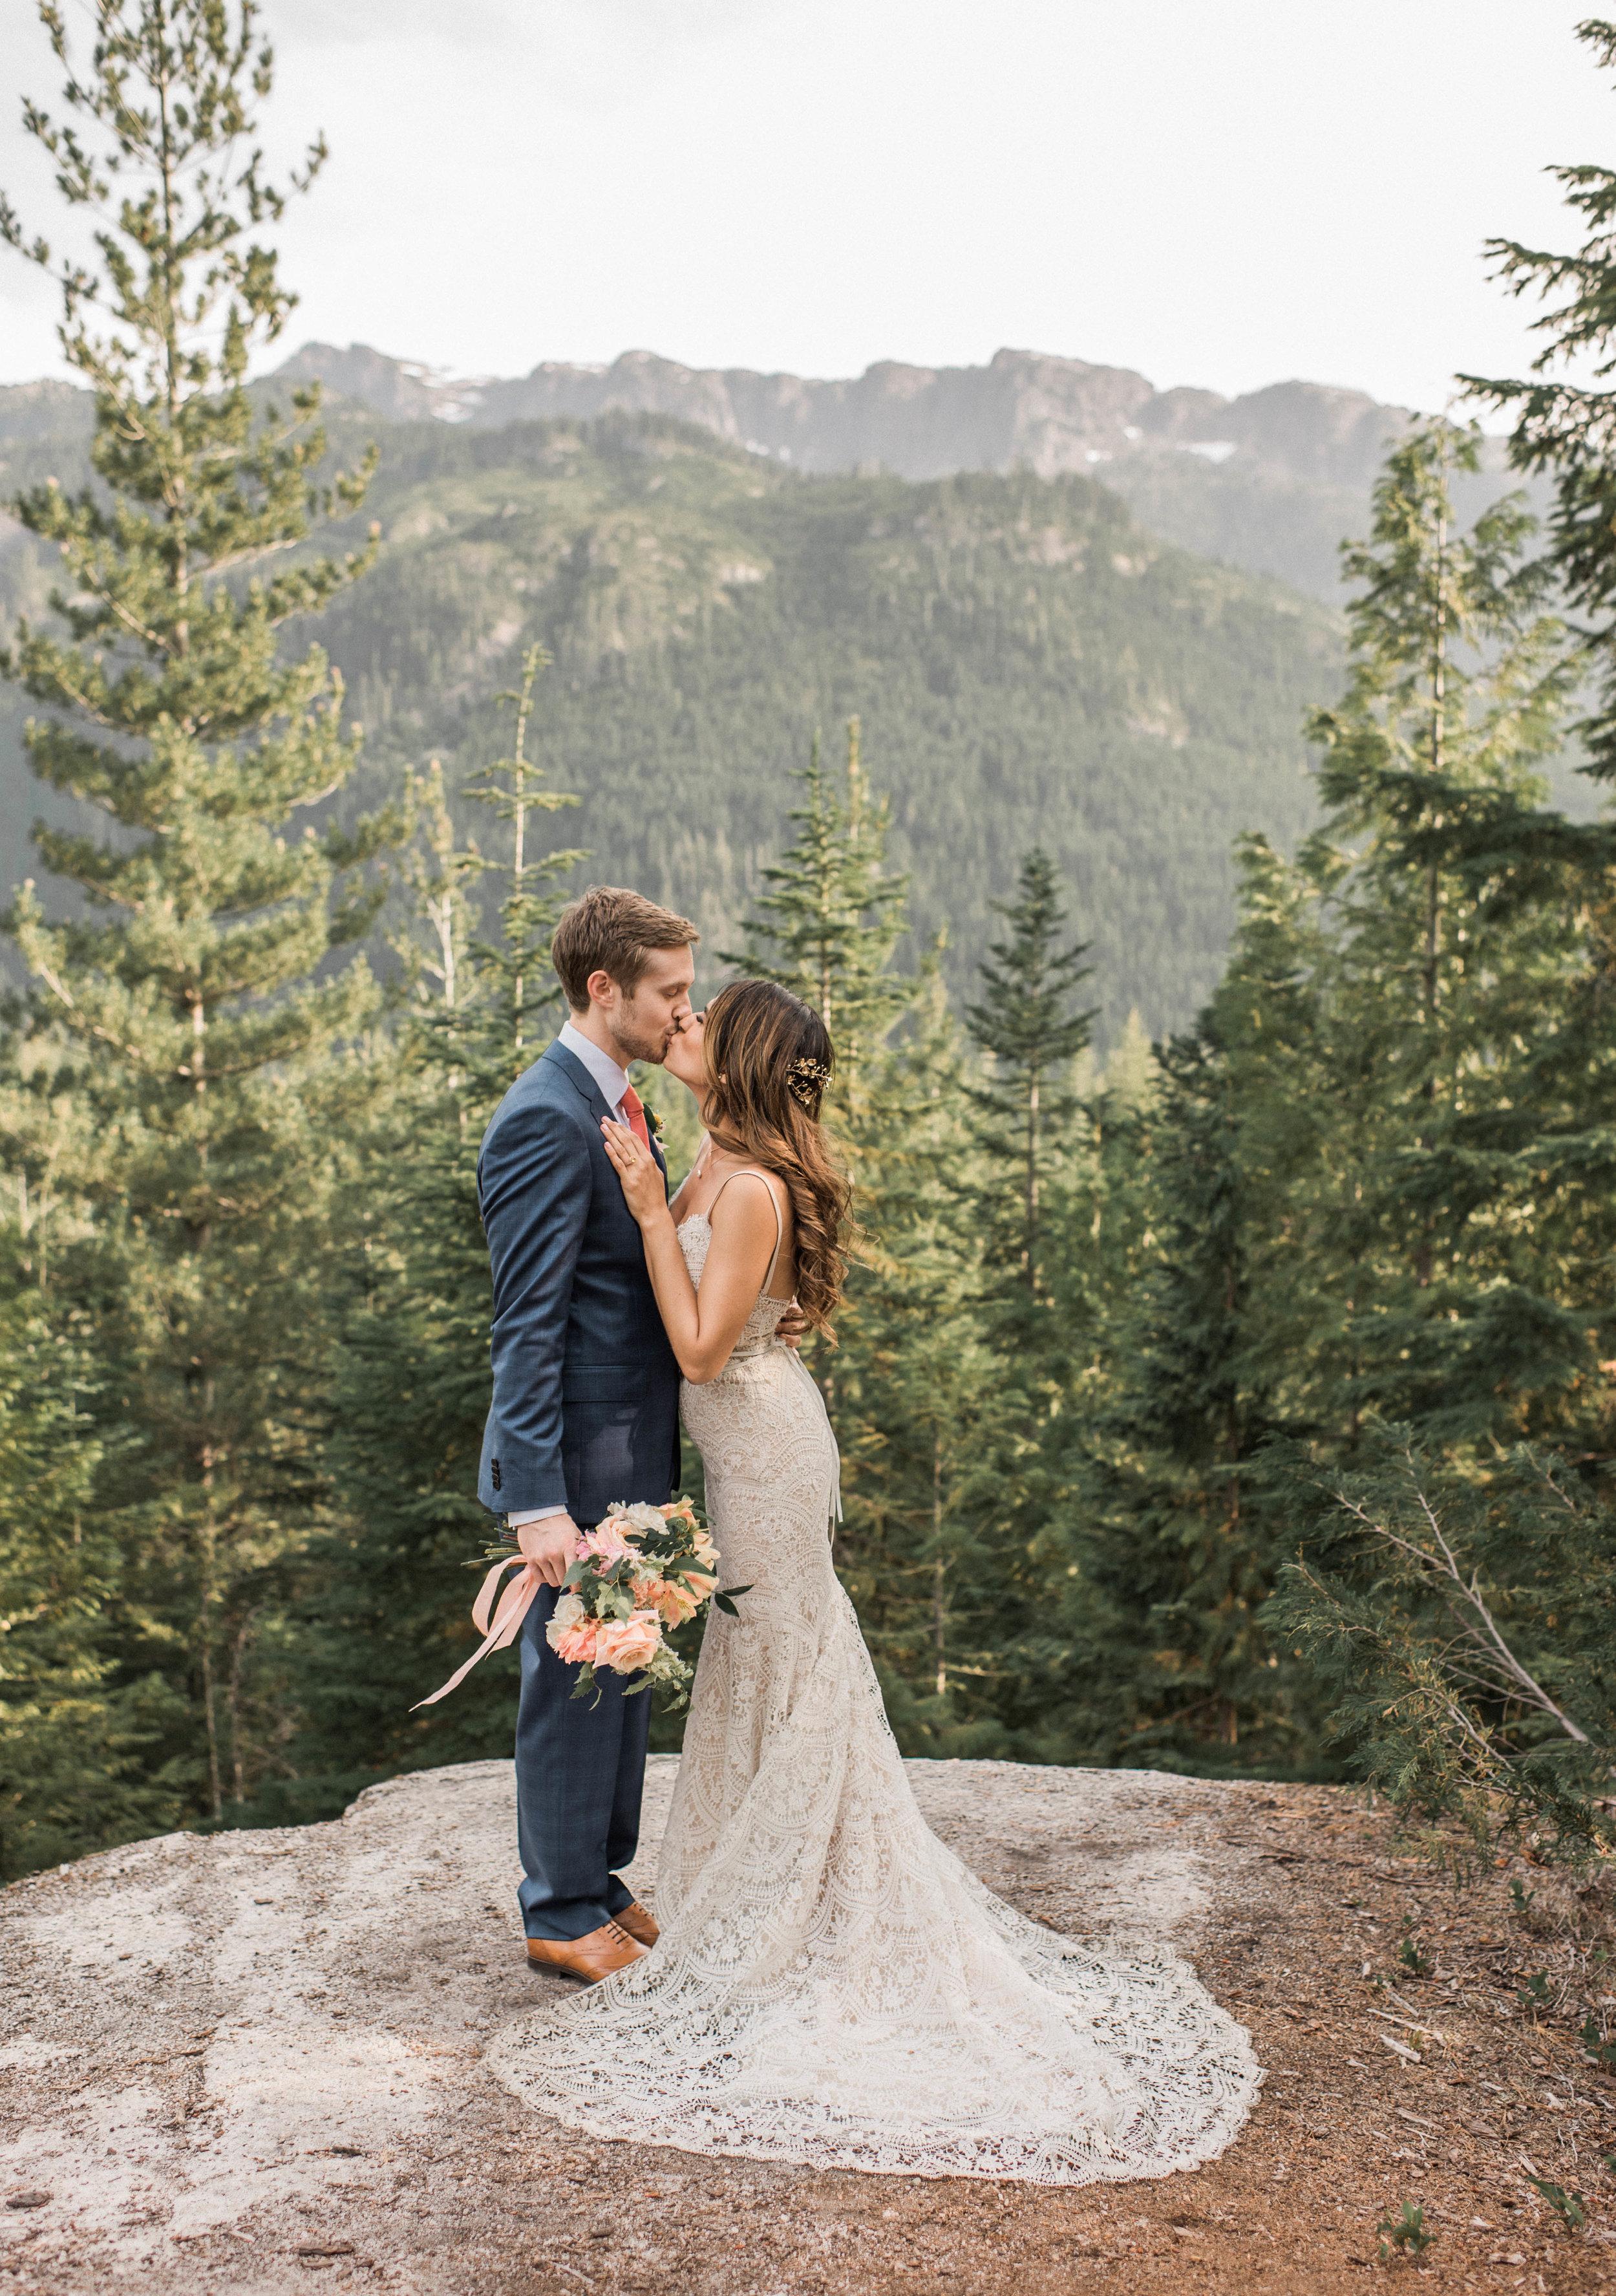 austin-texas-wedding-photography-1778-photographie-56.jpg